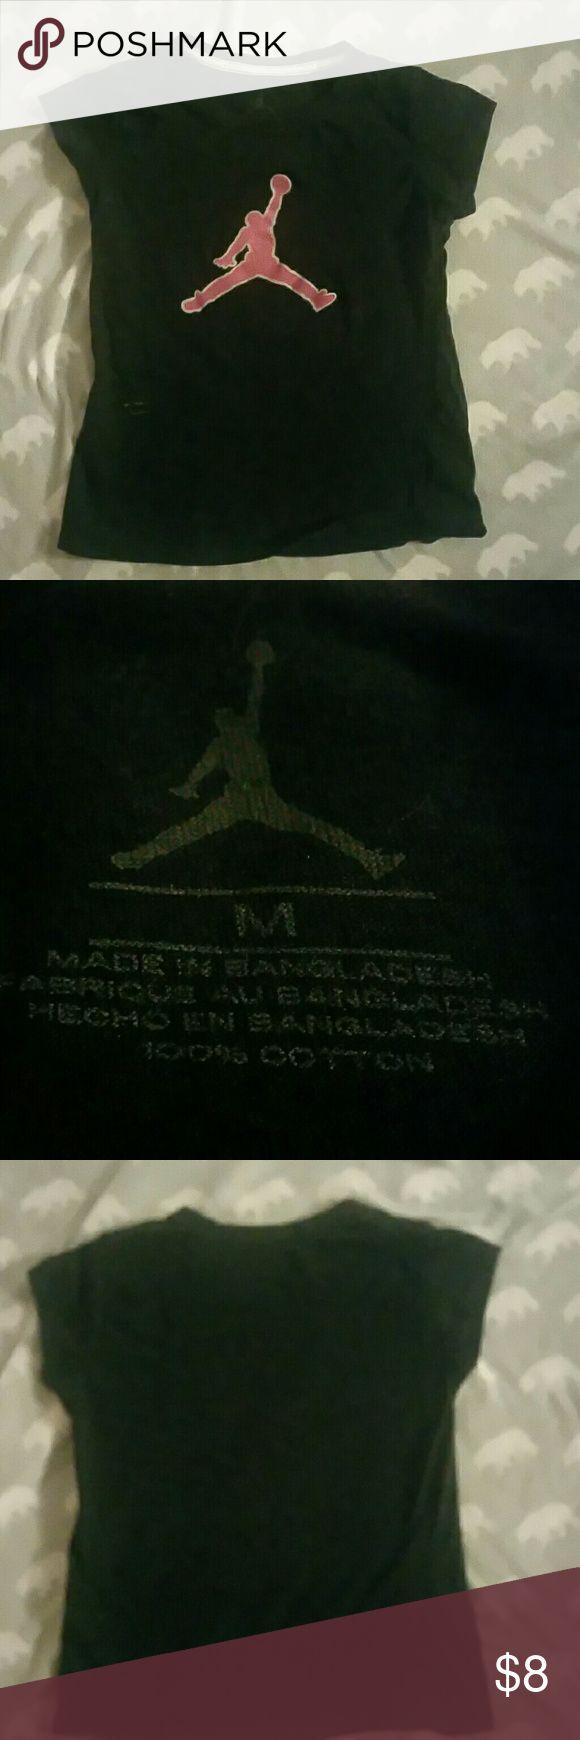 Black Jordan Tee-shirt. Great quality, pink and black, Jordan logo featured on front. Jordan Shirts & Tops Tees - Short Sleeve